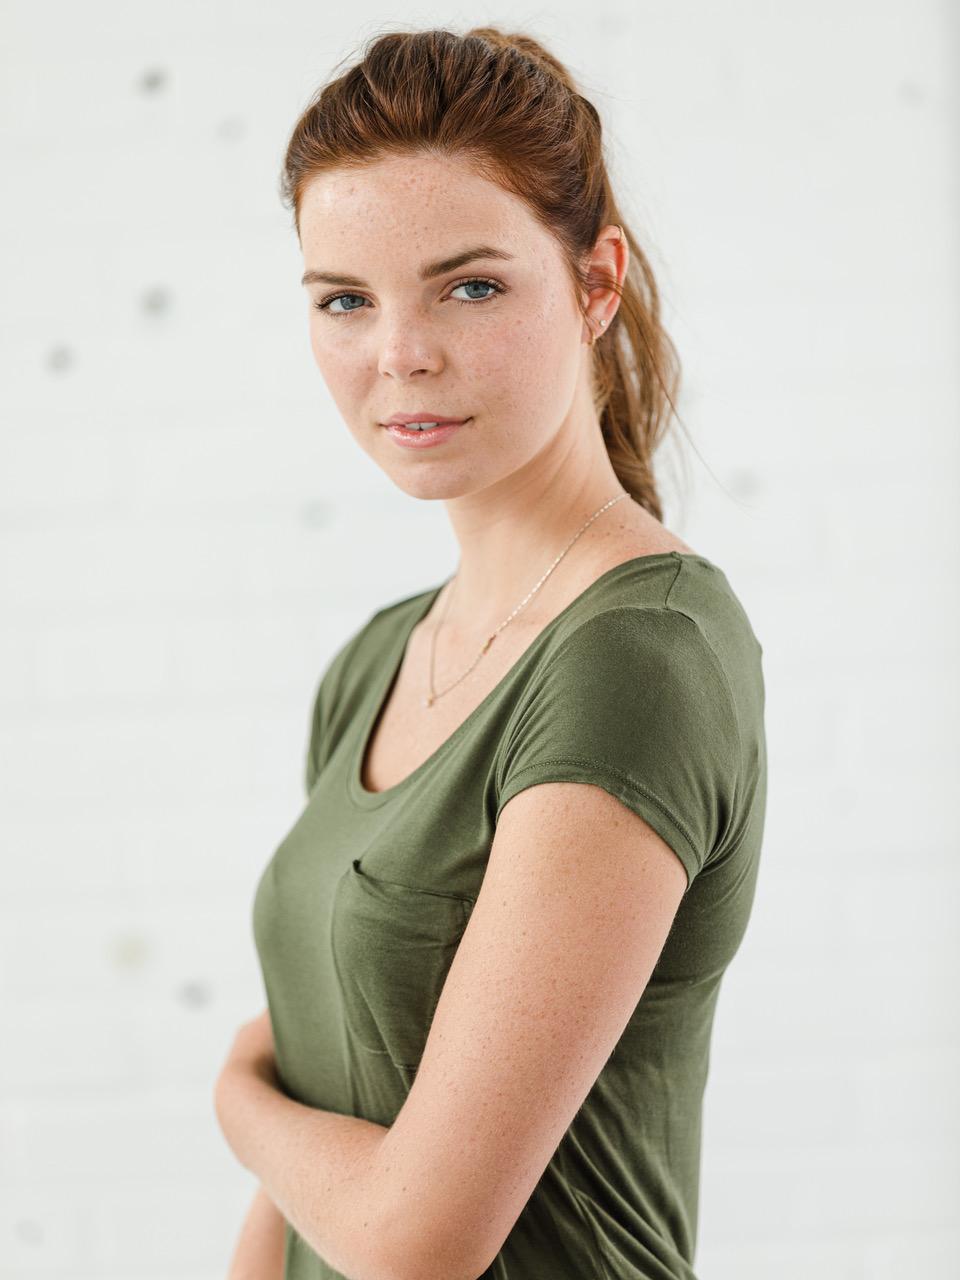 Cindy Piche Bernier